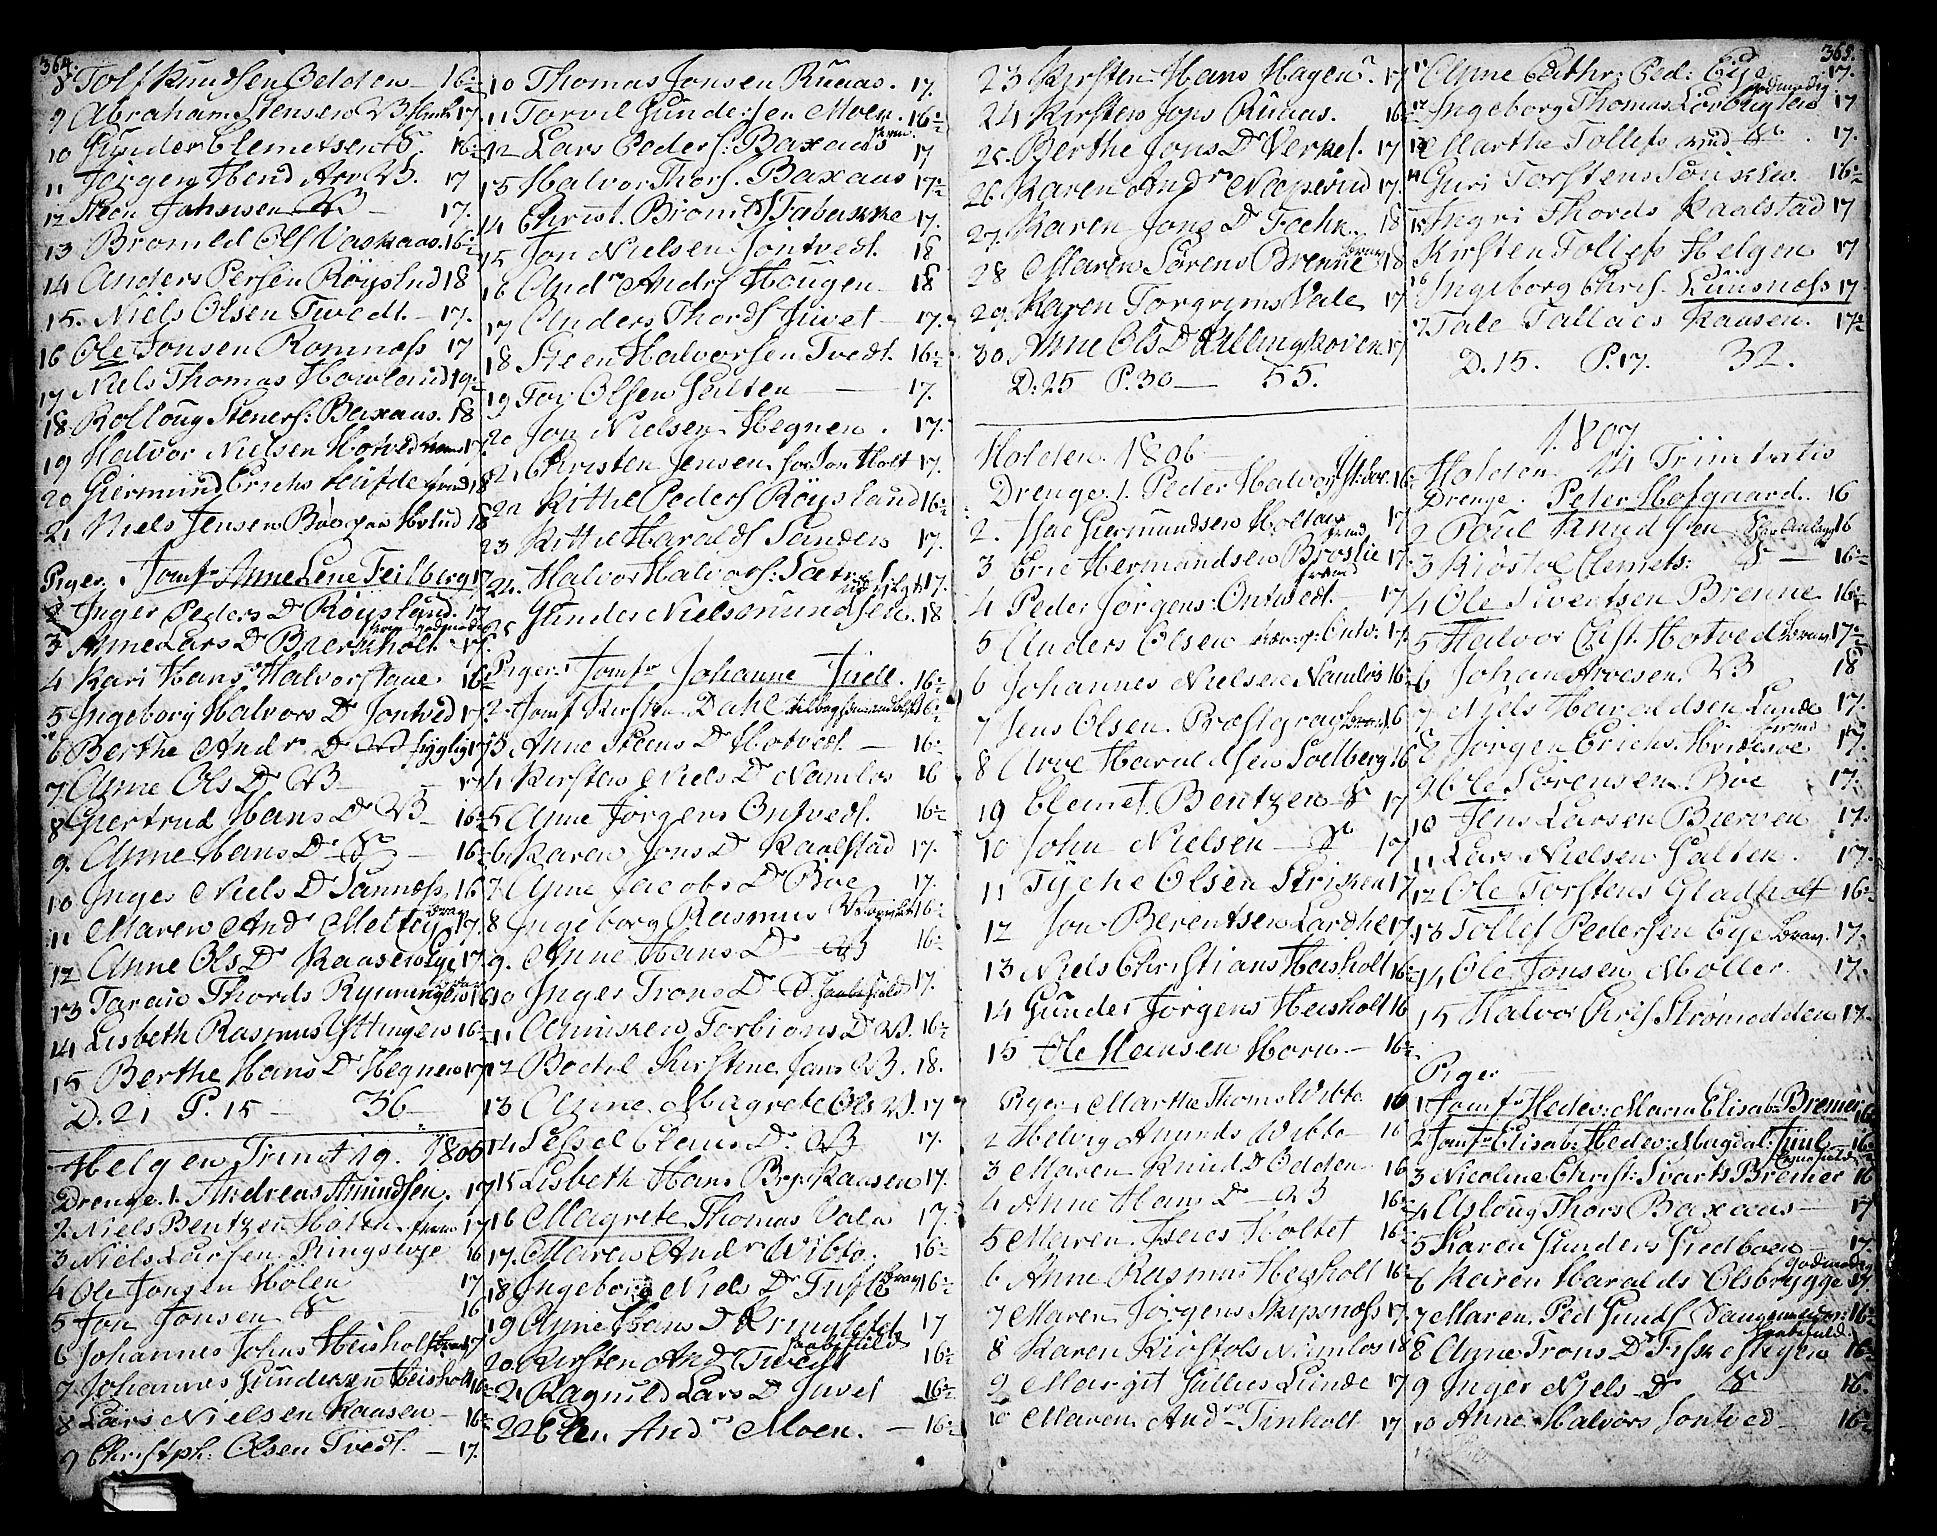 SAKO, Holla kirkebøker, F/Fa/L0002: Ministerialbok nr. 2, 1779-1814, s. 364-365